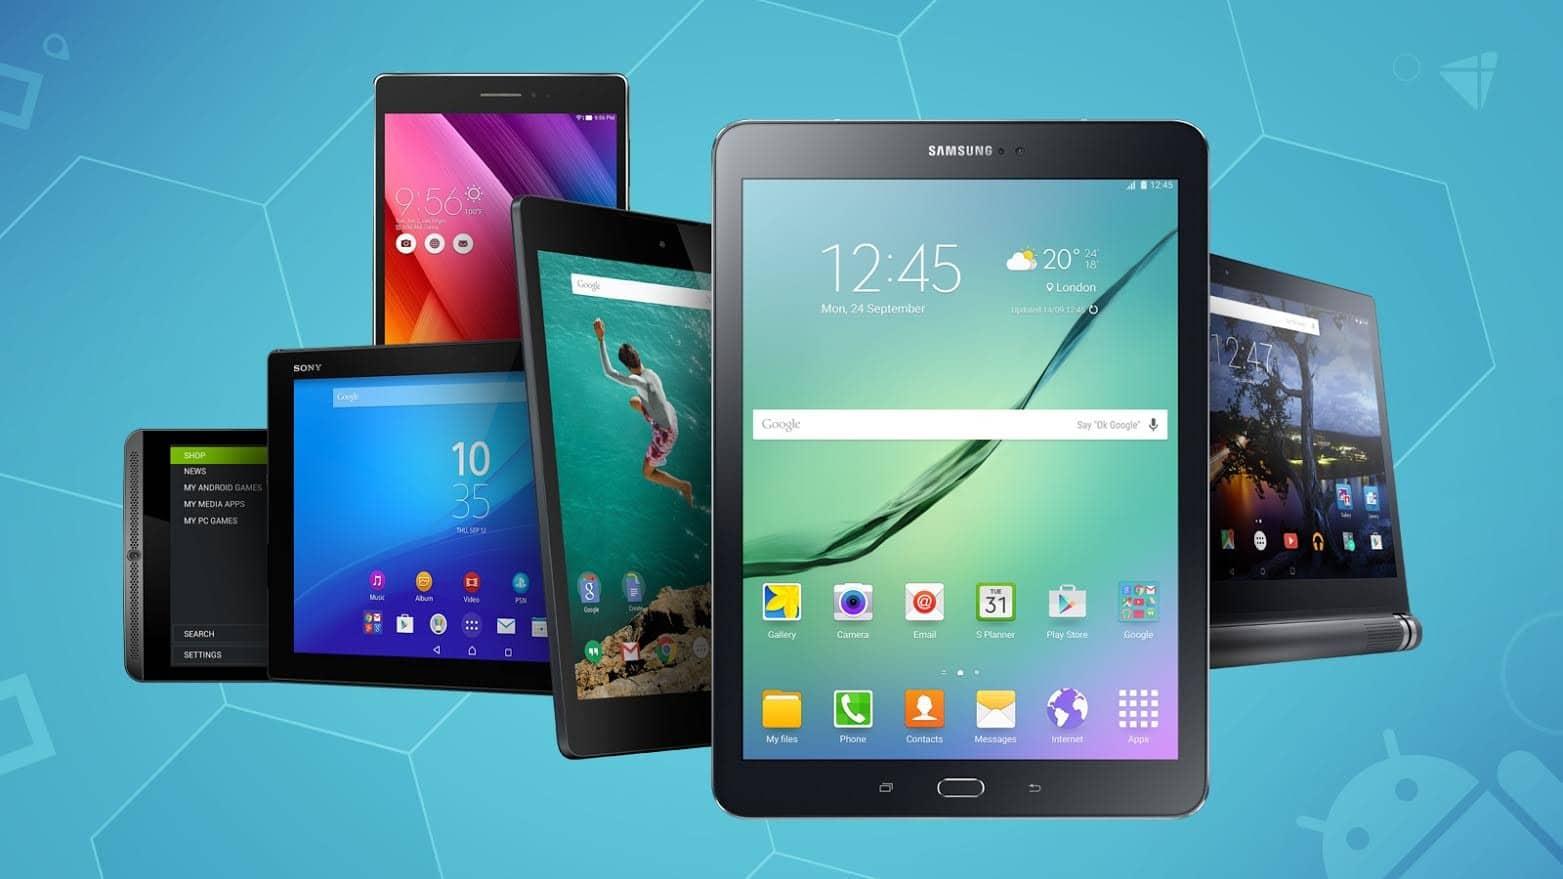 Google is no longer making tablets